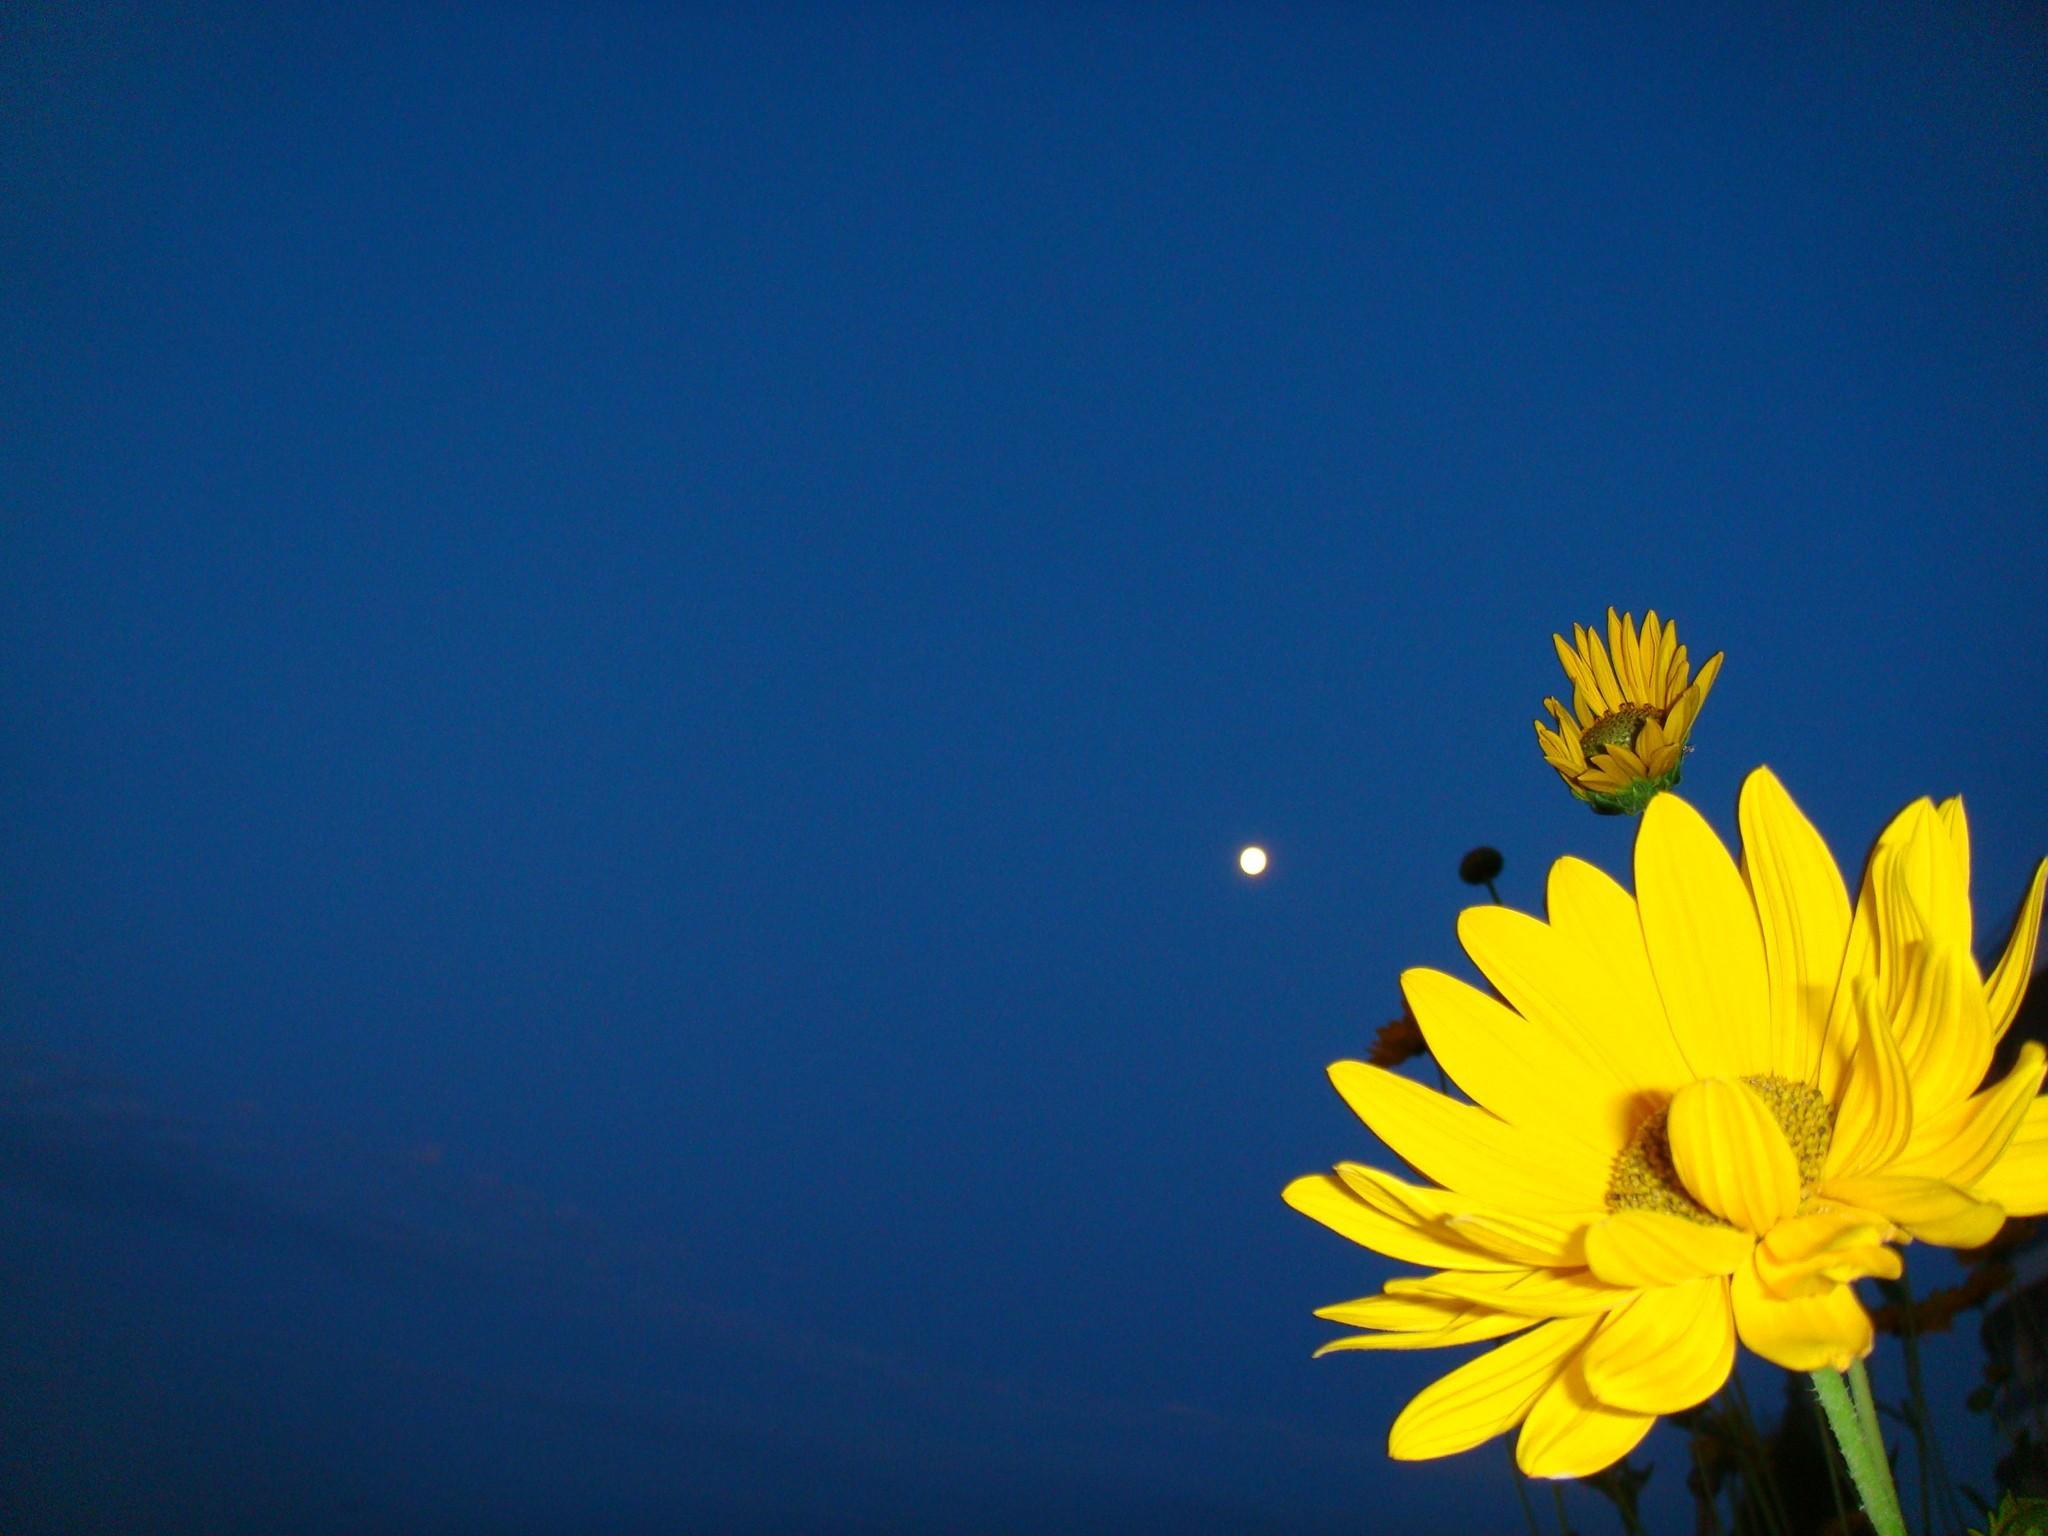 yellow and dark blue background on a dark blue